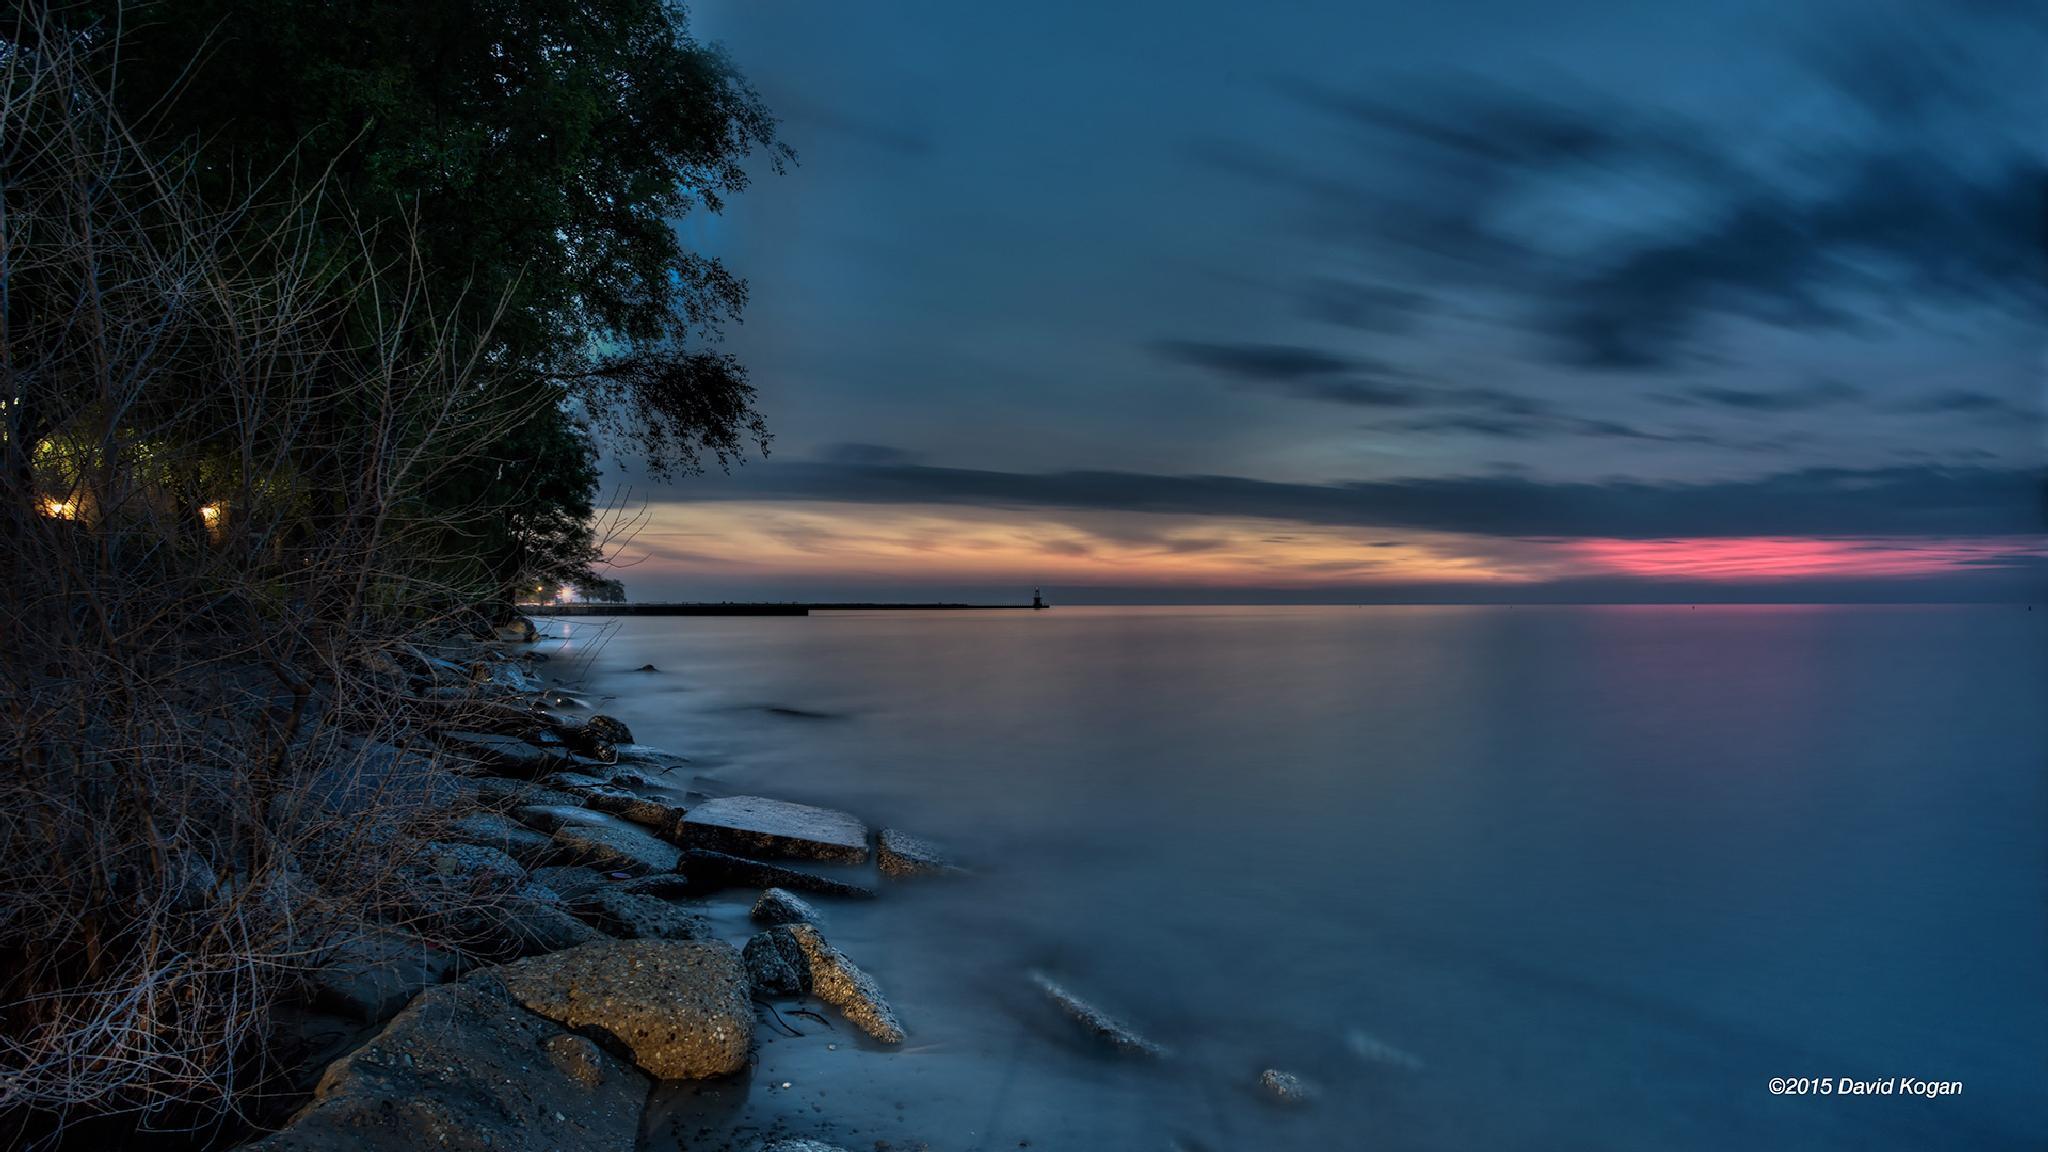 Sunrise Summer Solstice by David Kogan